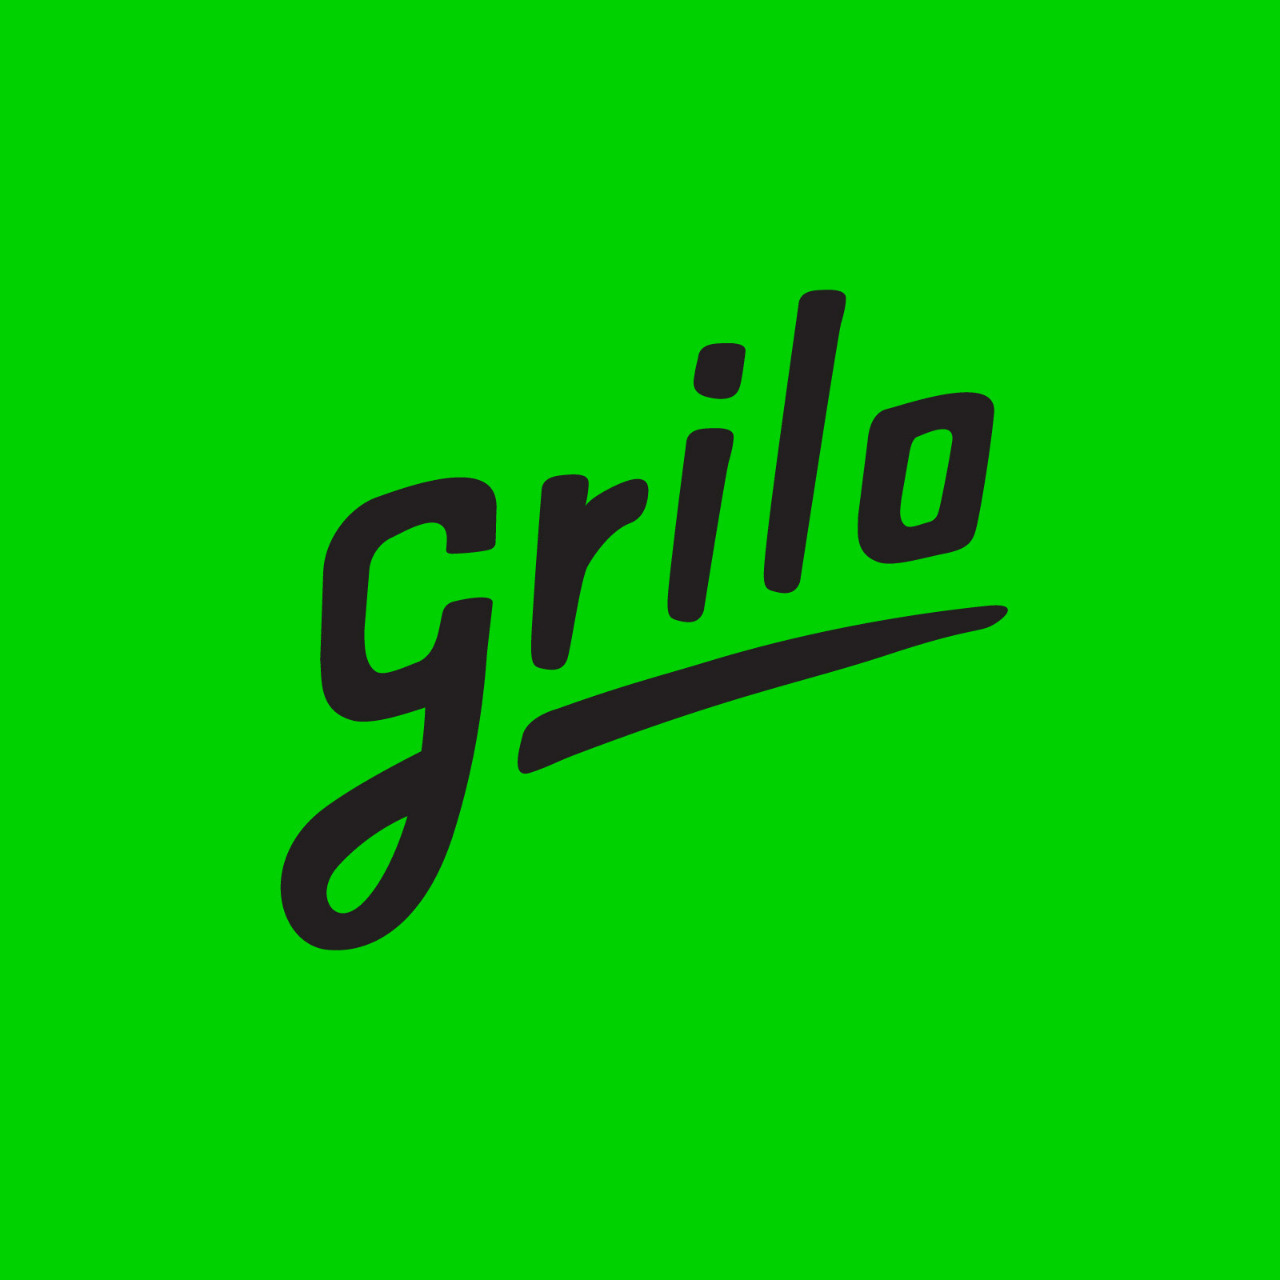 Logo Grilo